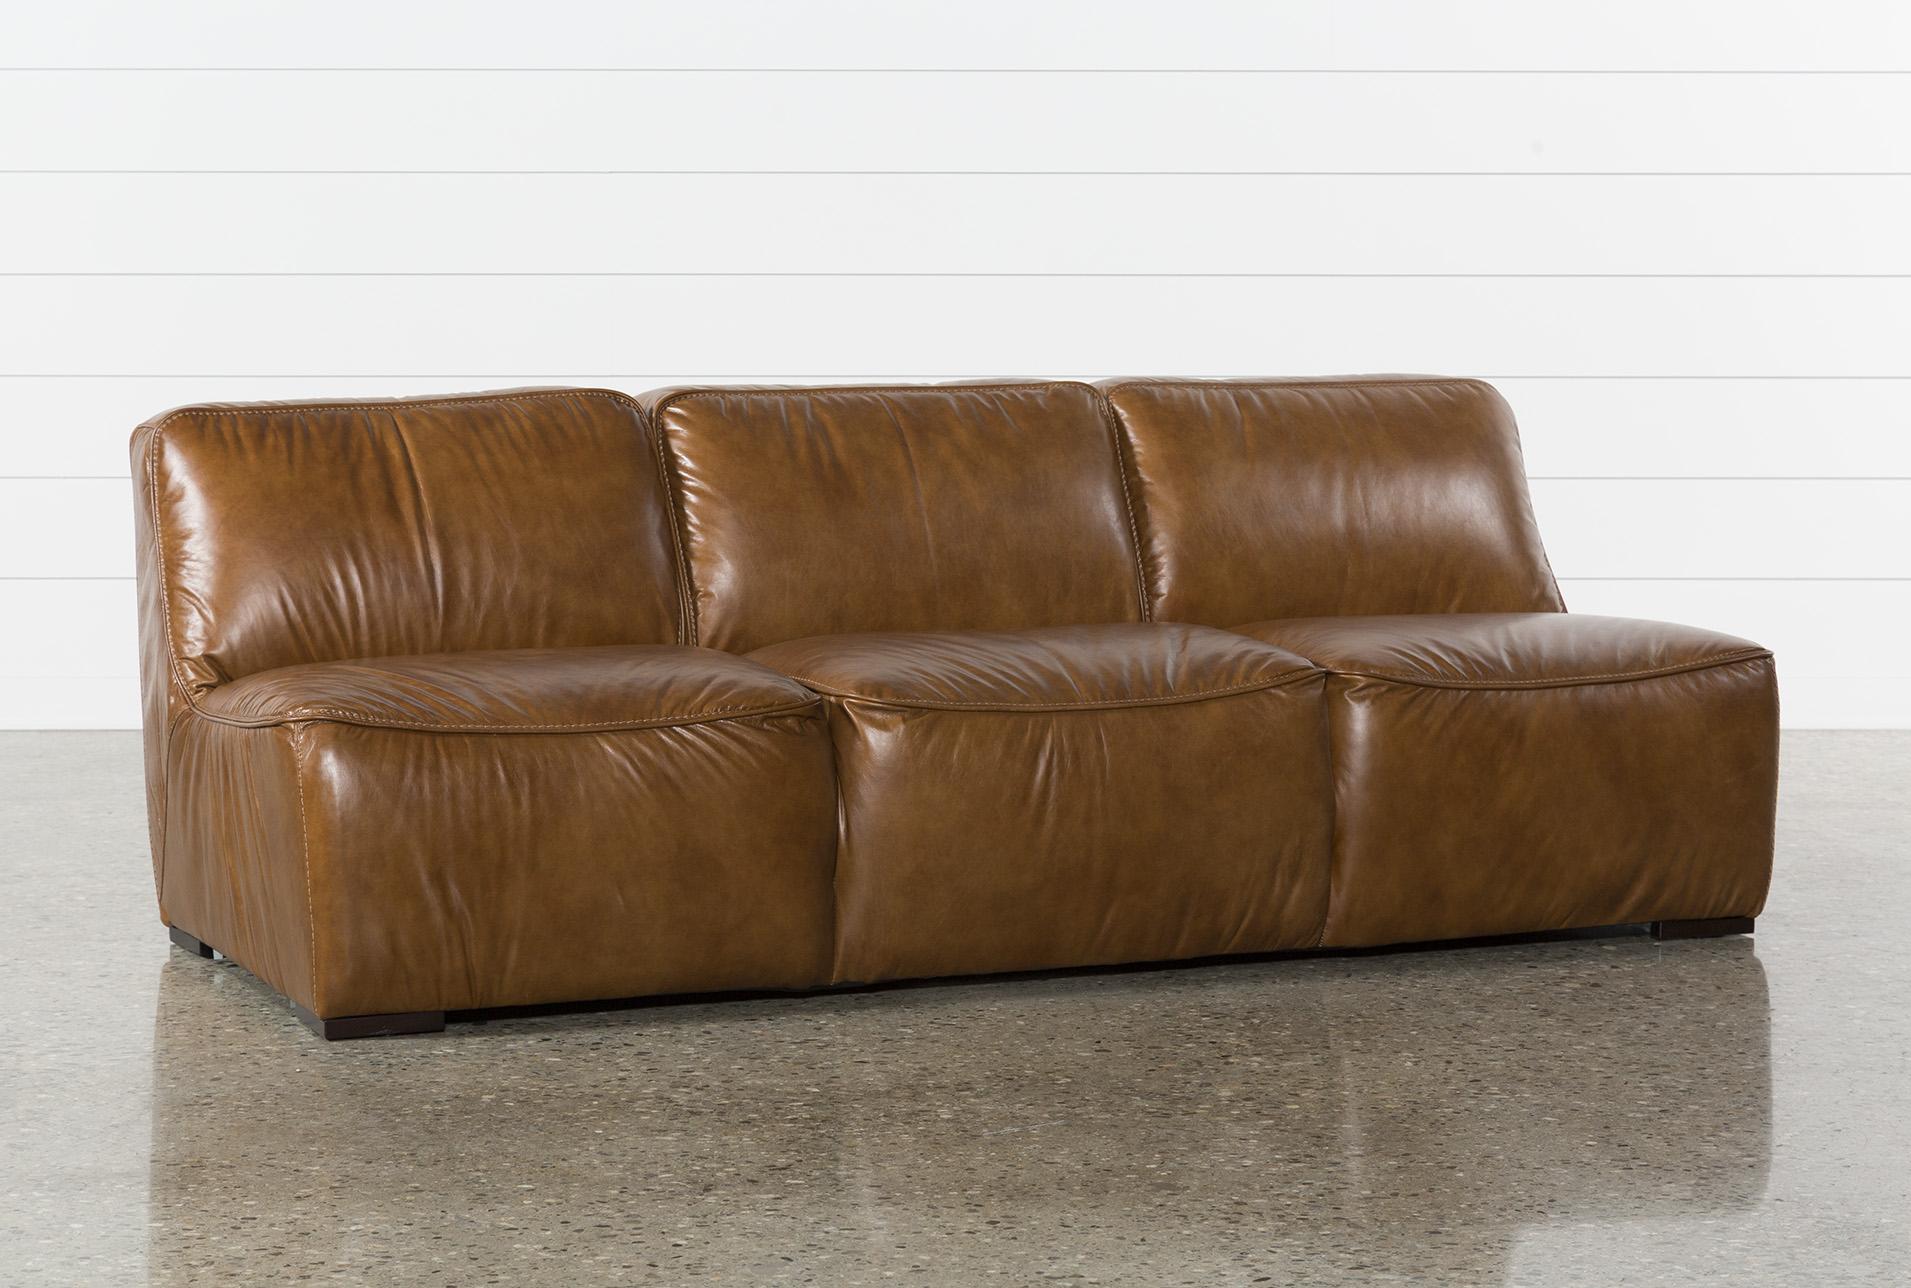 burton leather armless sofa living spaces rh livingspaces com leather sofa burton on trent Bungalow Burton Sofa